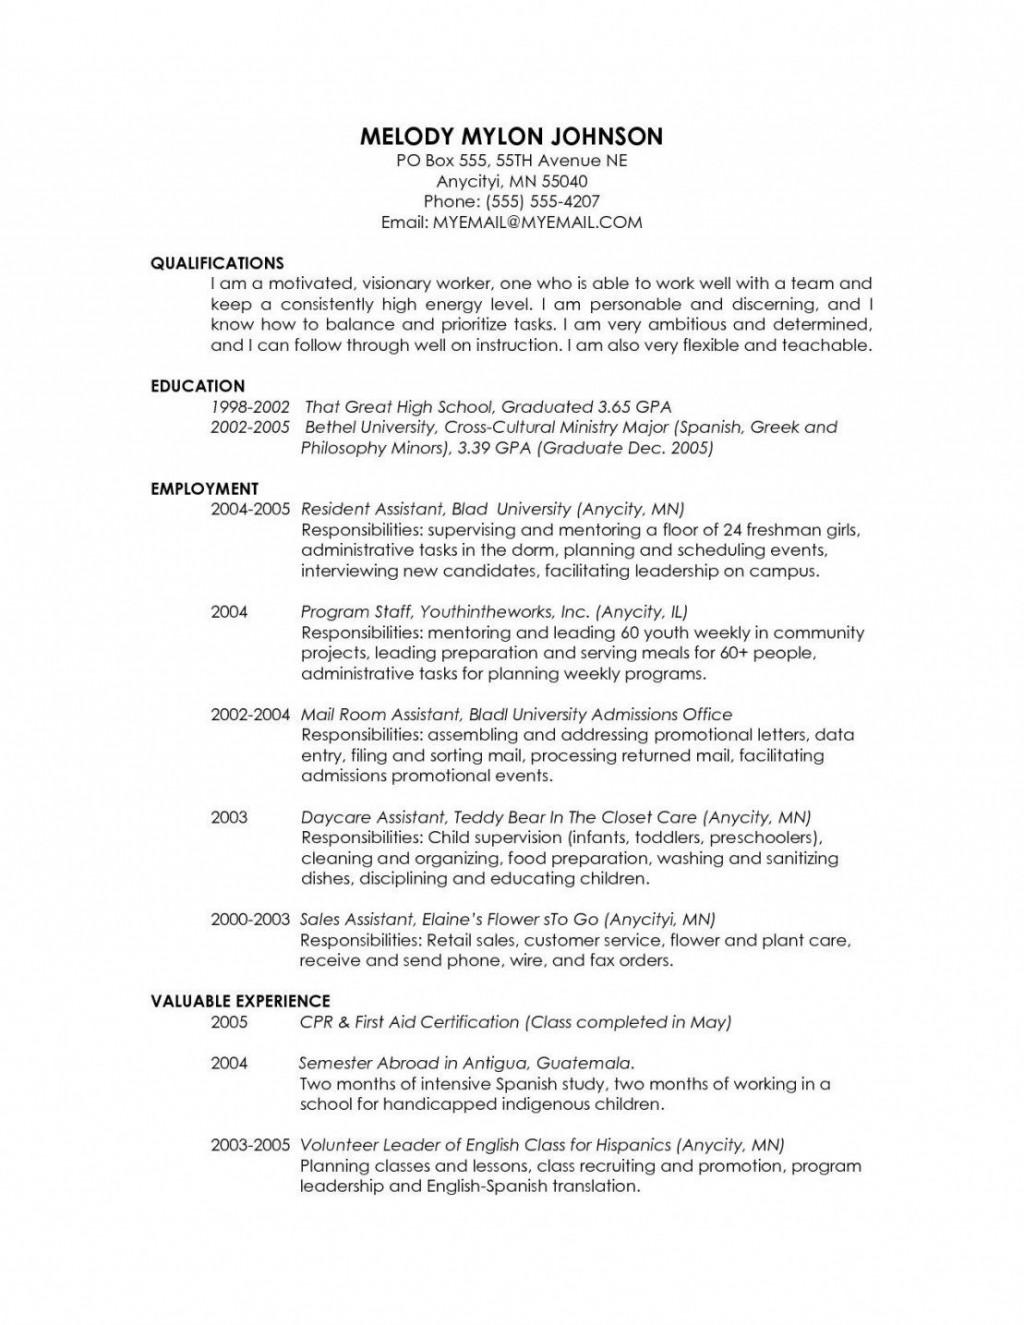 002 Beautiful Graduate School Curriculum Vitae Template Image  For Application Resume FormatLarge